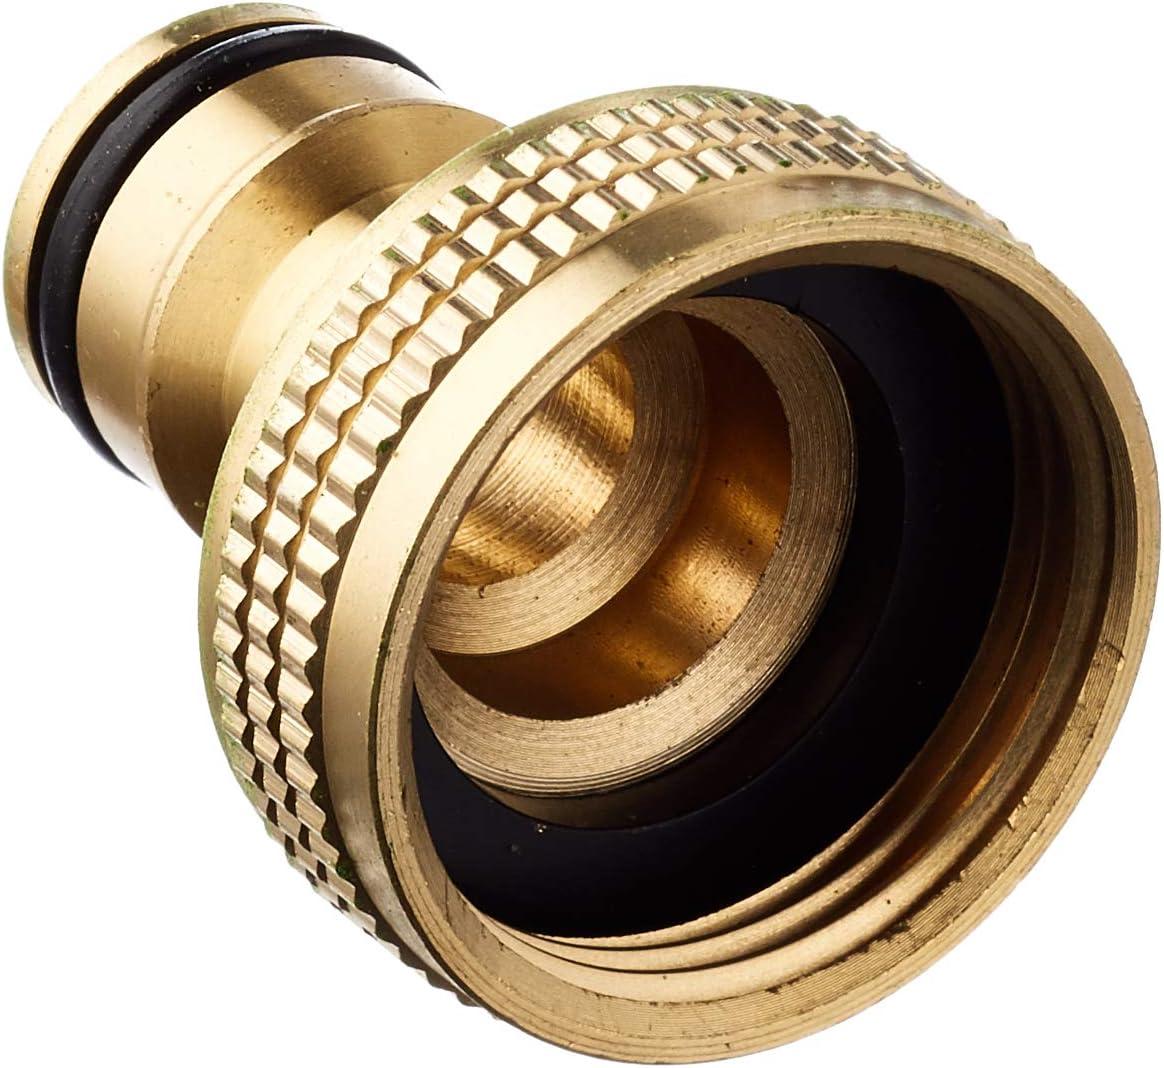 Boutté 0102709 Hahnanschlussstück Automatisch Messing Weiblich Adf20 Messing 3 6 X 3 5 X 3 Cm Baumarkt